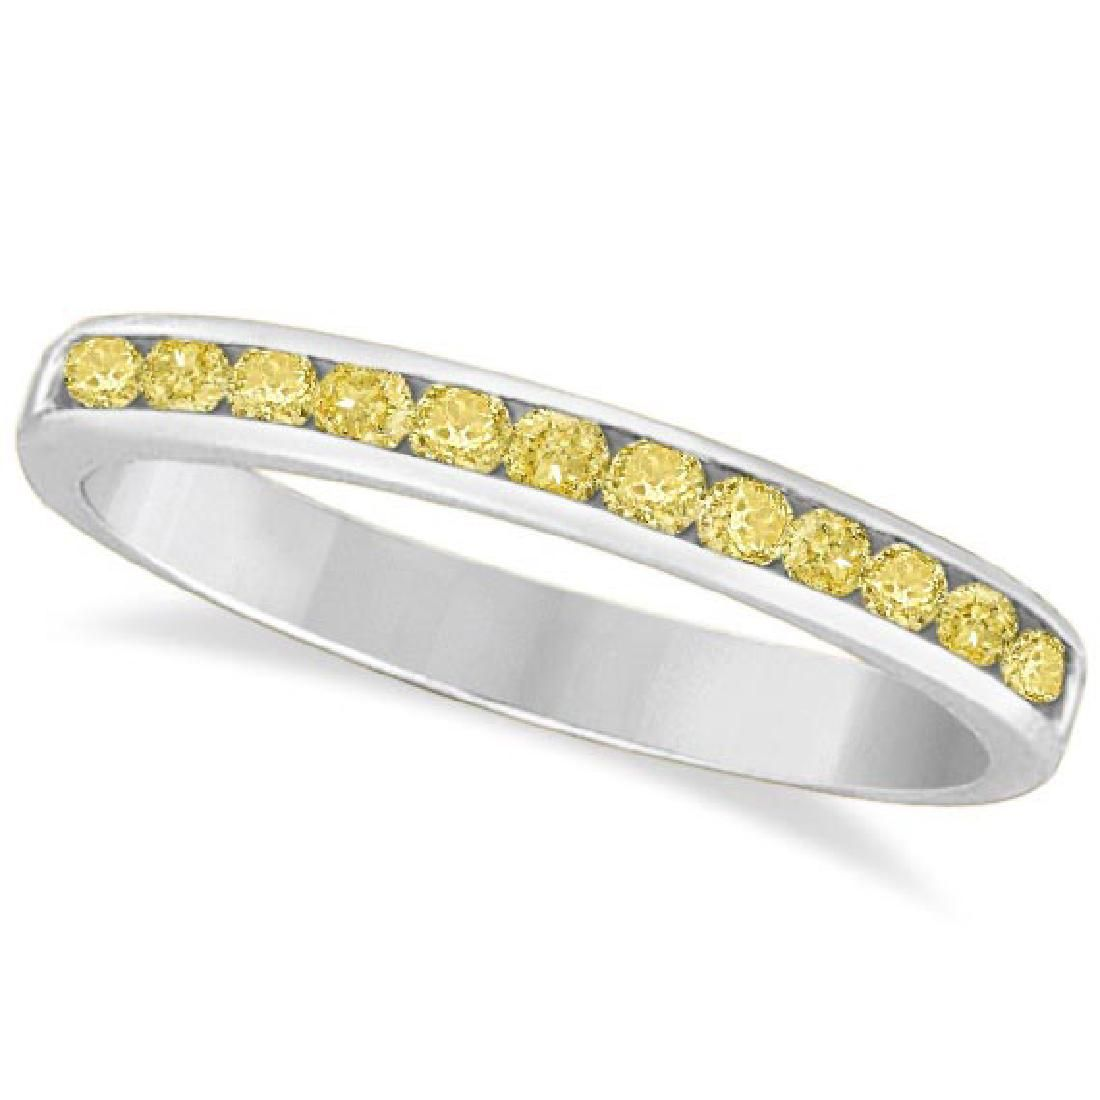 Channel-Set Yellow Canary Diamond Ring Band 14k White G